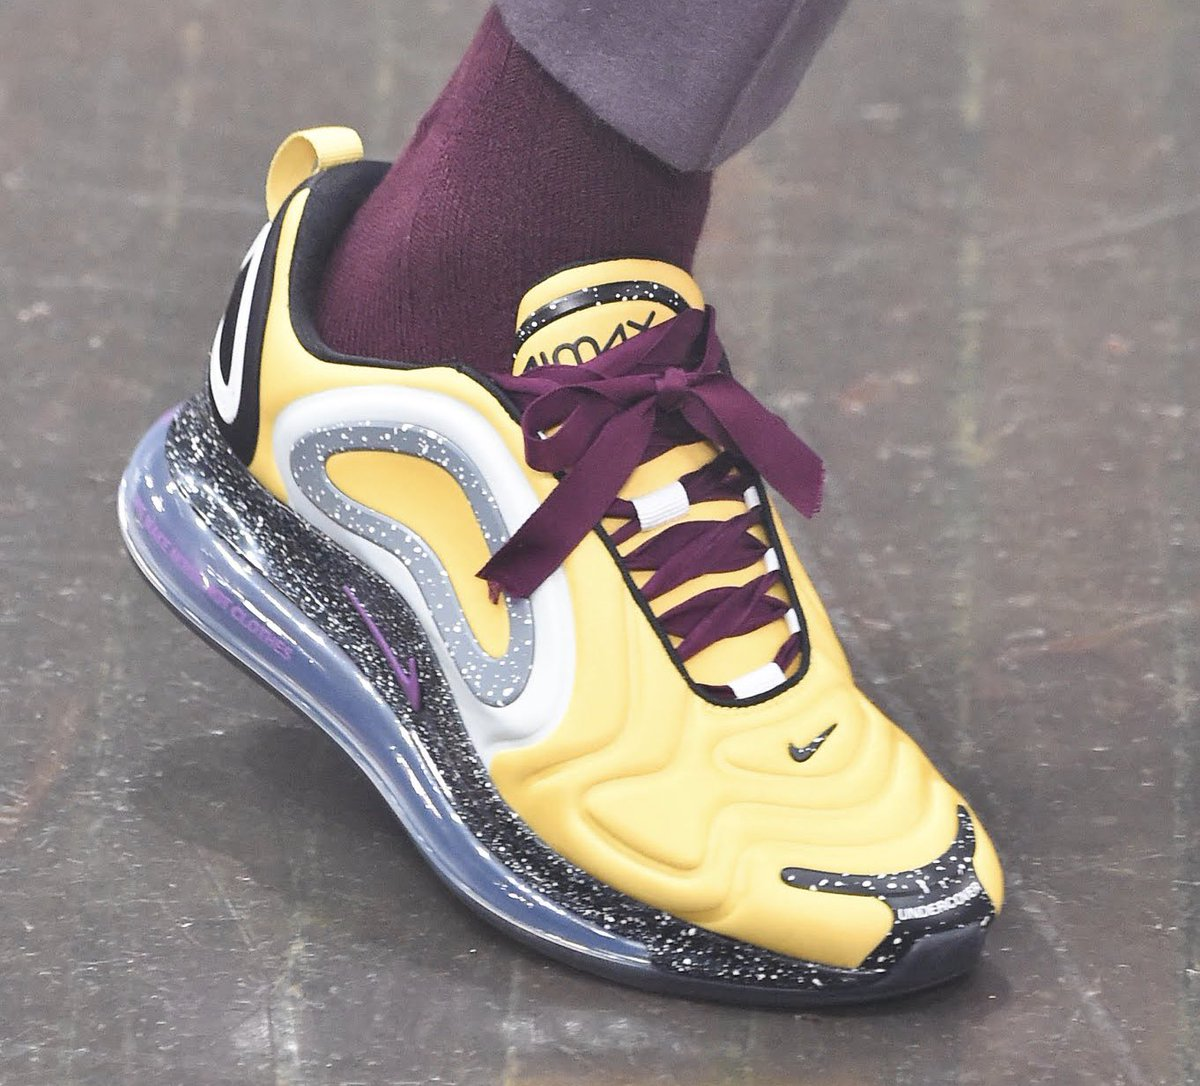 sports shoes ac790 3a86e Complex SneakersVerified account